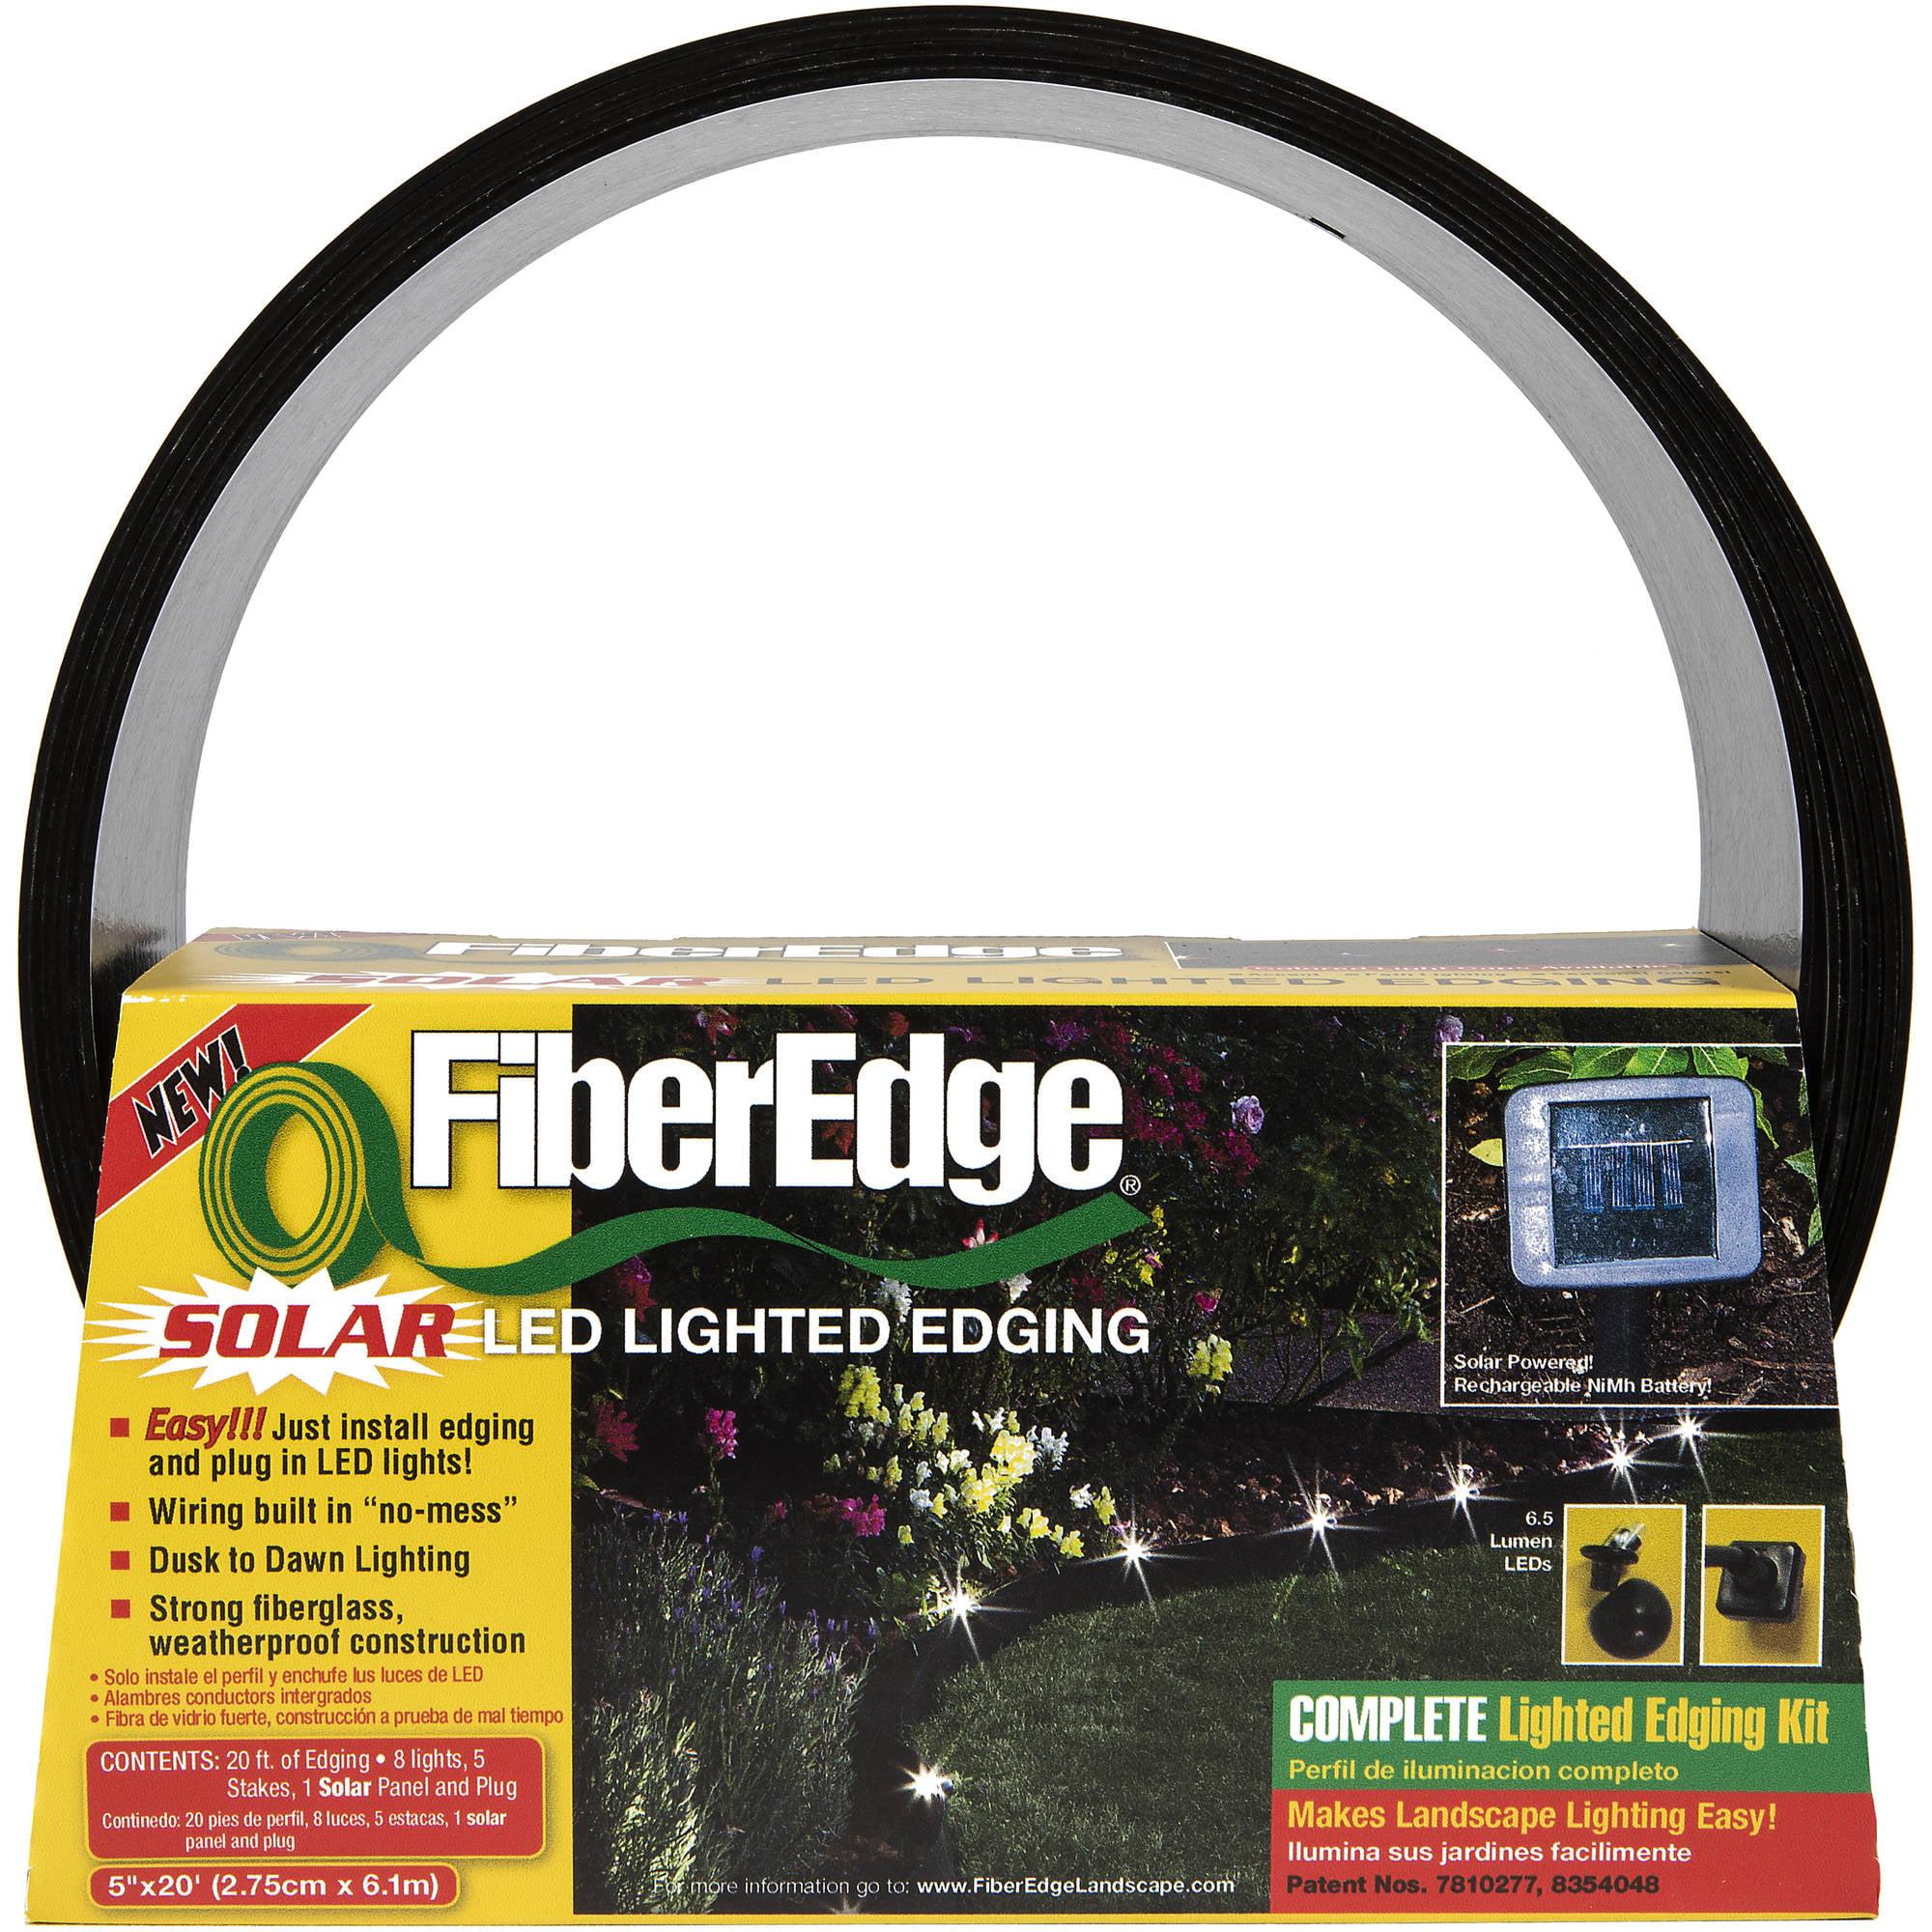 Fiberedge Solar Led Lighted Landscape Edging 5 X 20 Black Light Circuit Images Buy Fiberglass